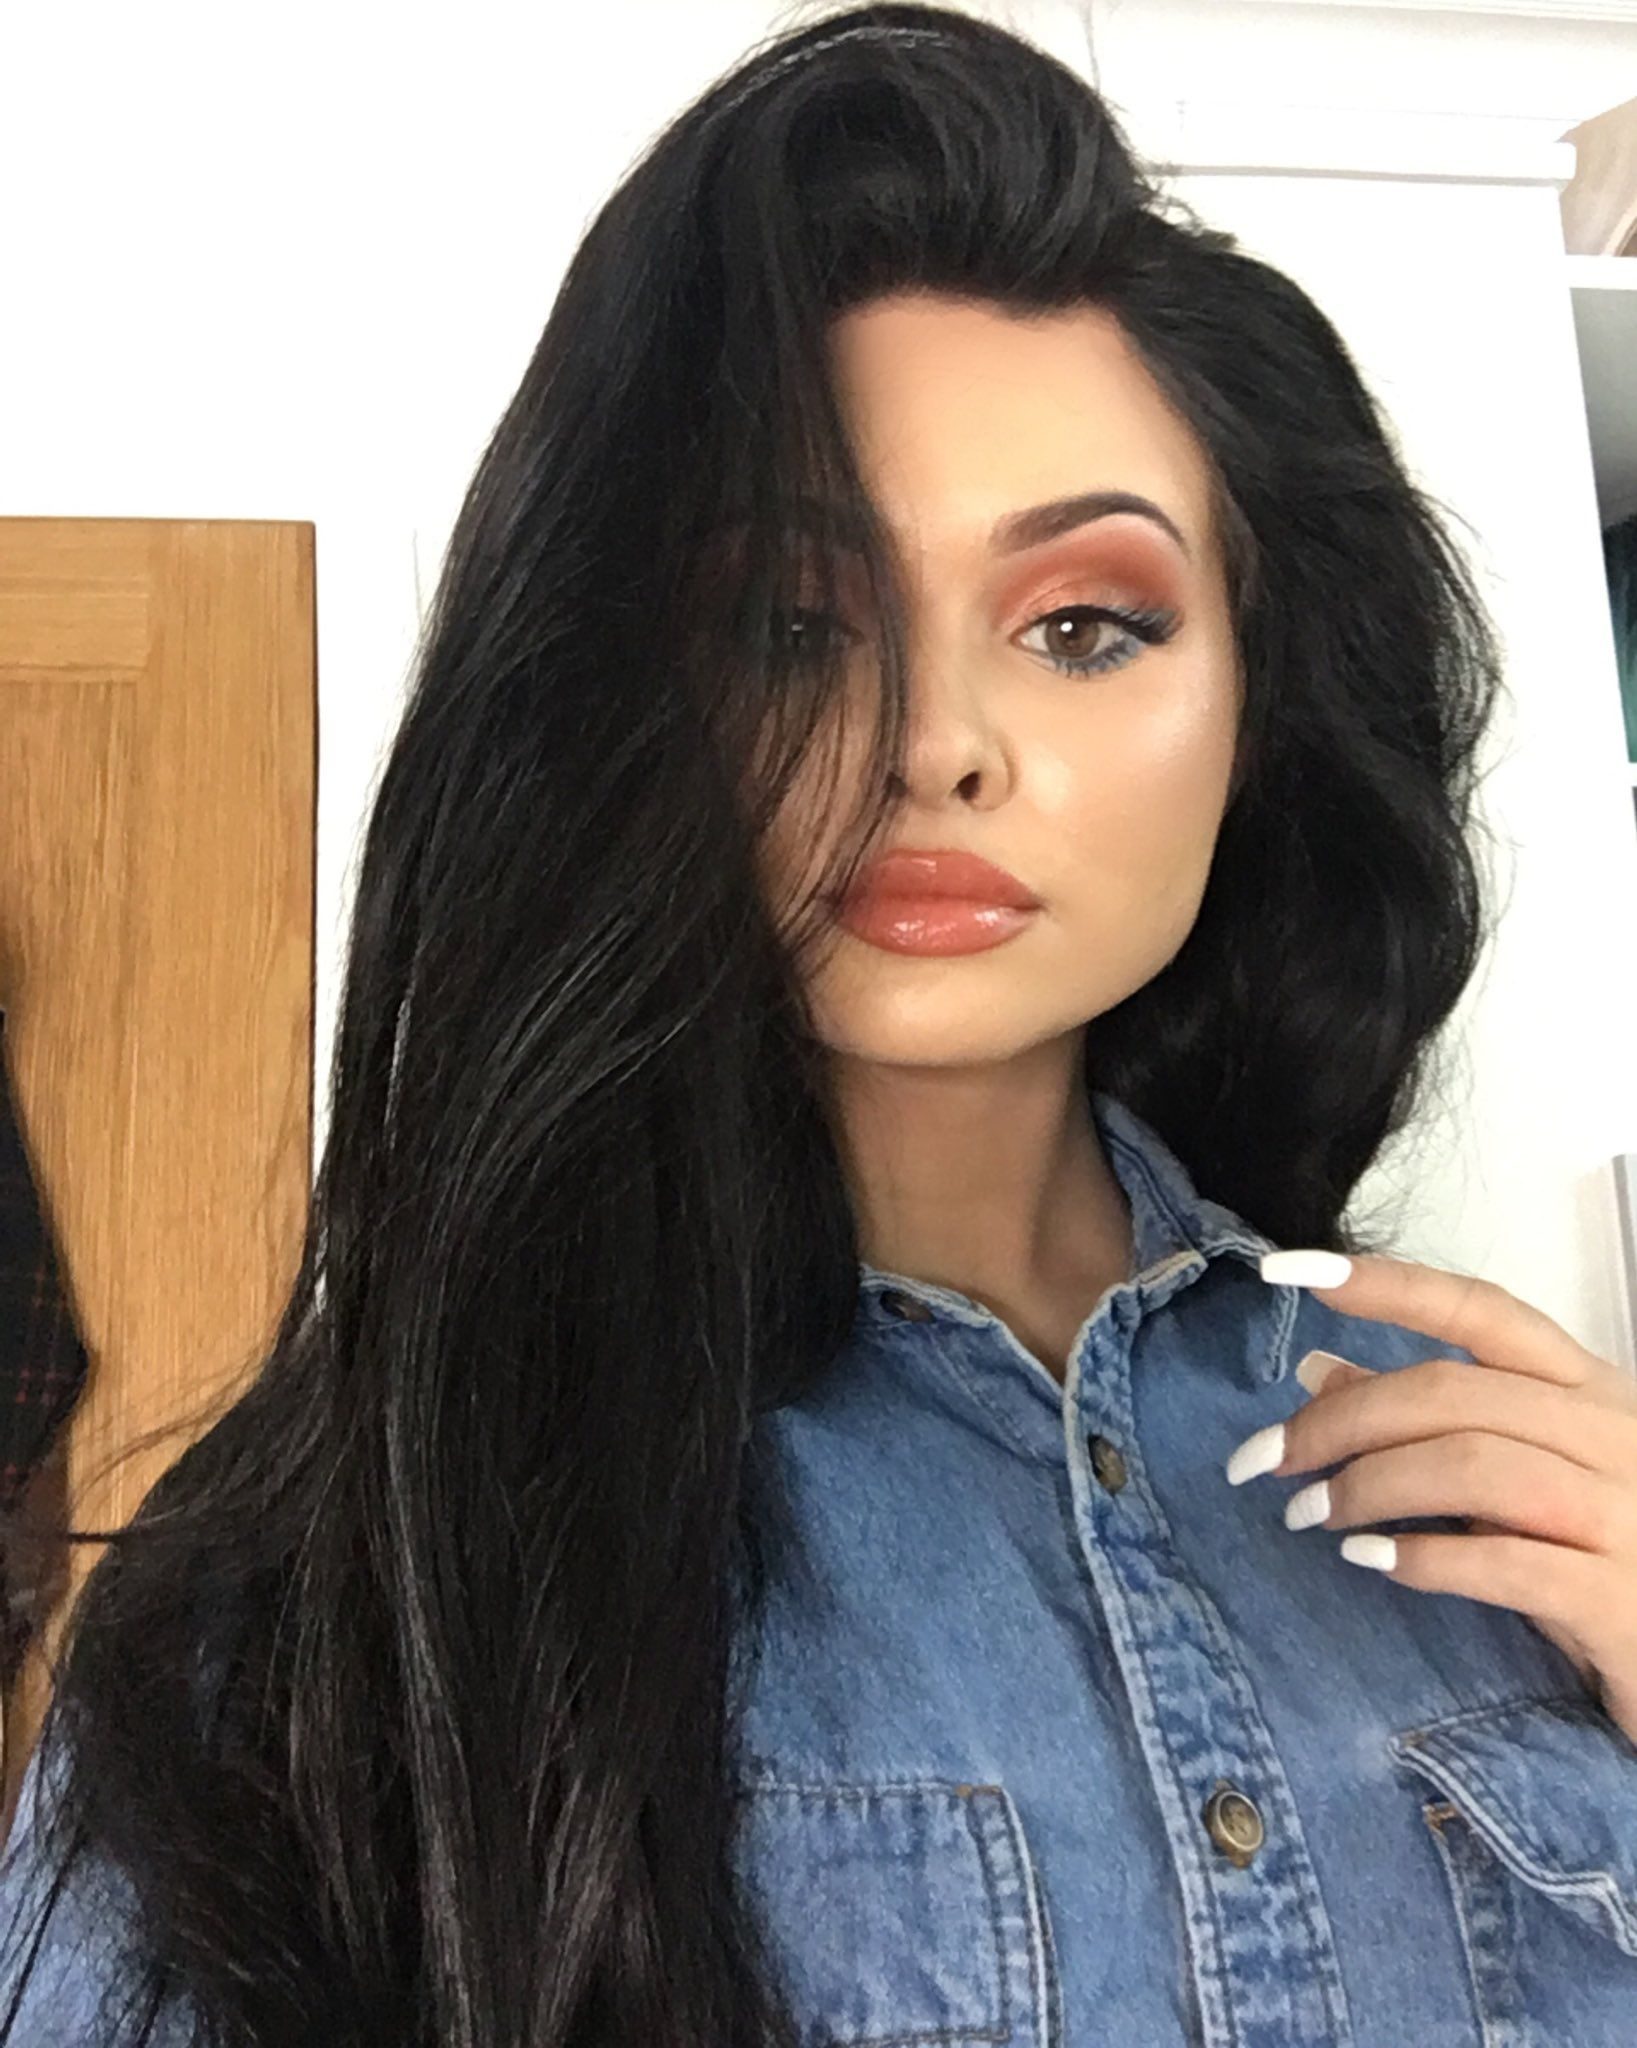 Images Cara Brett nude (76 photo), Pussy, Leaked, Selfie, underwear 2017